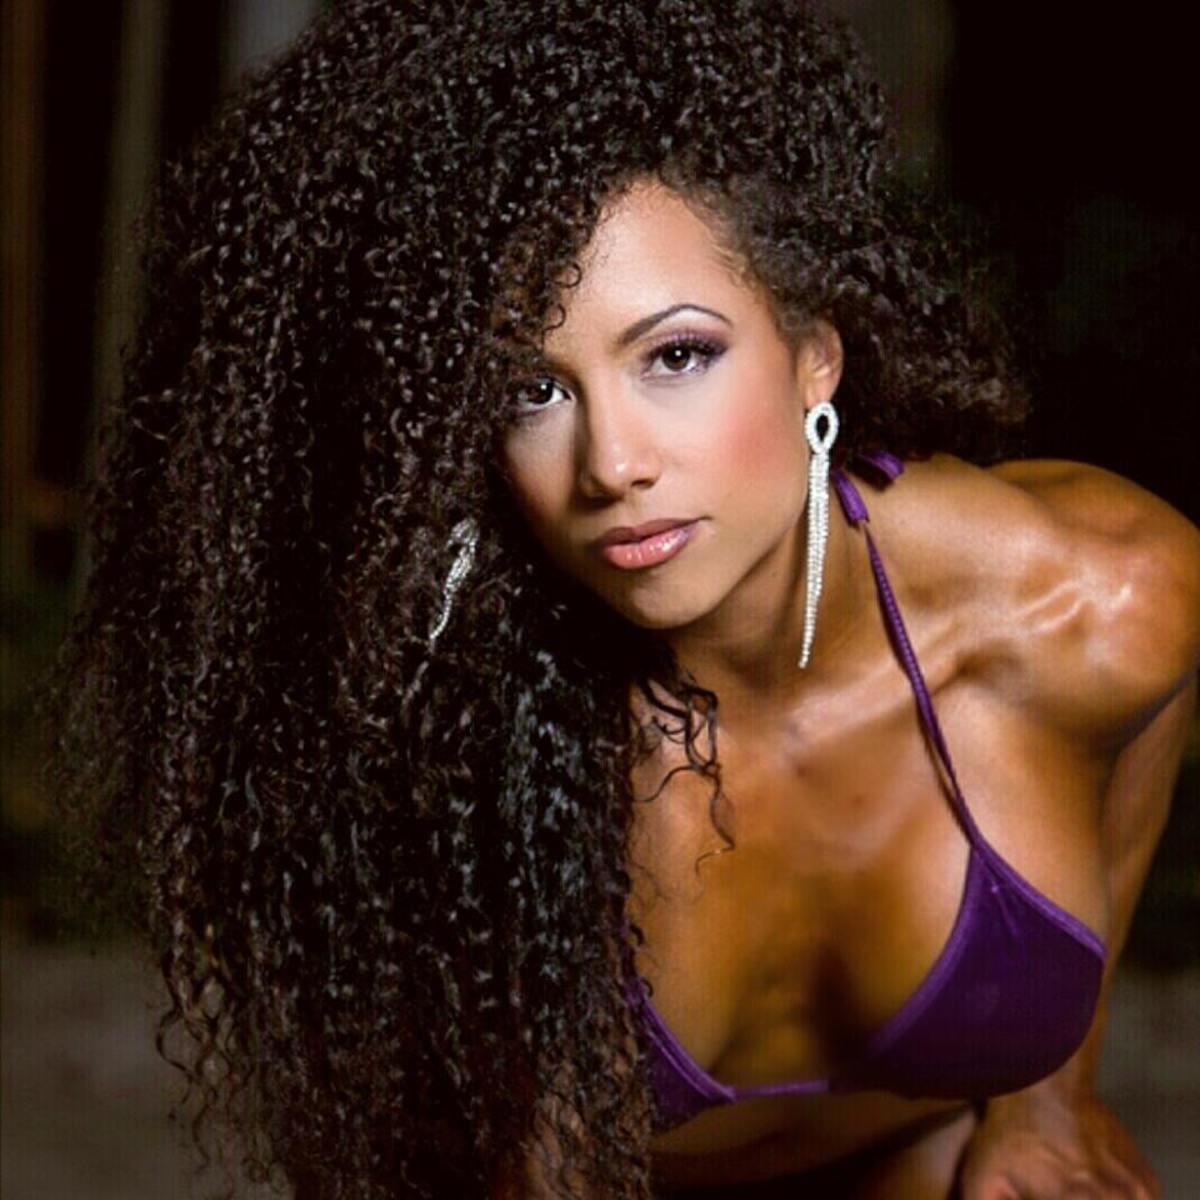 Bikini competitor Sondra Blockman